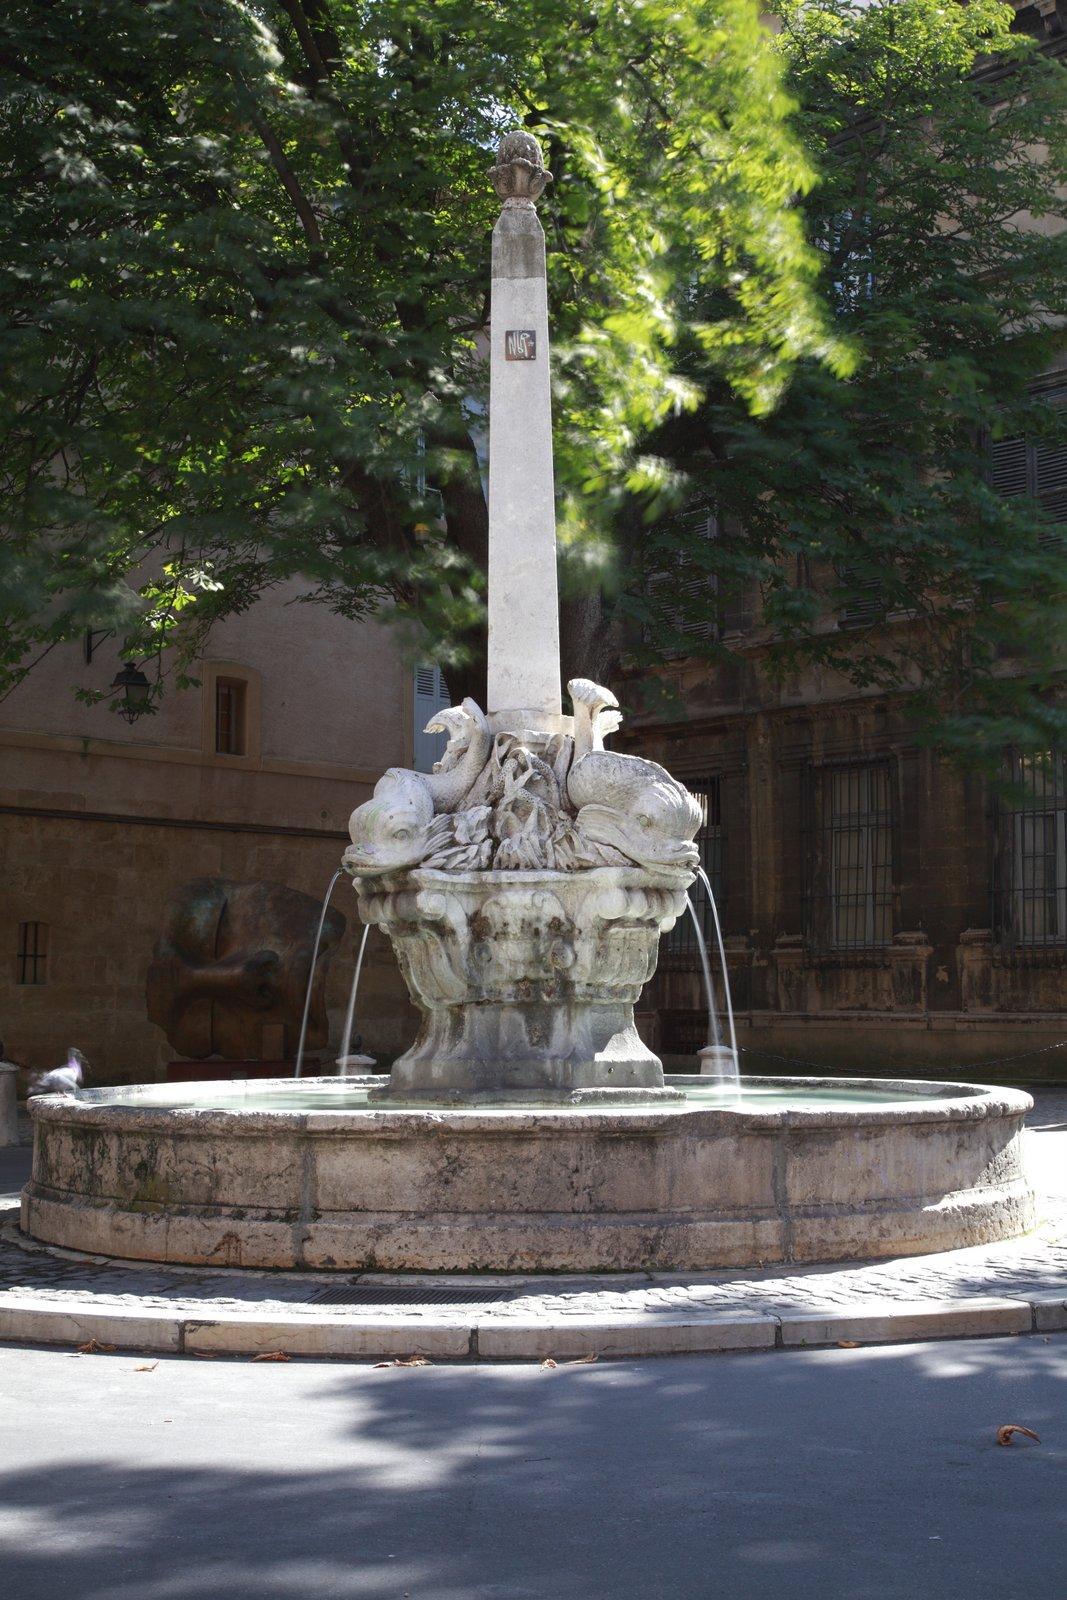 Fontaine des 4 Dauphins